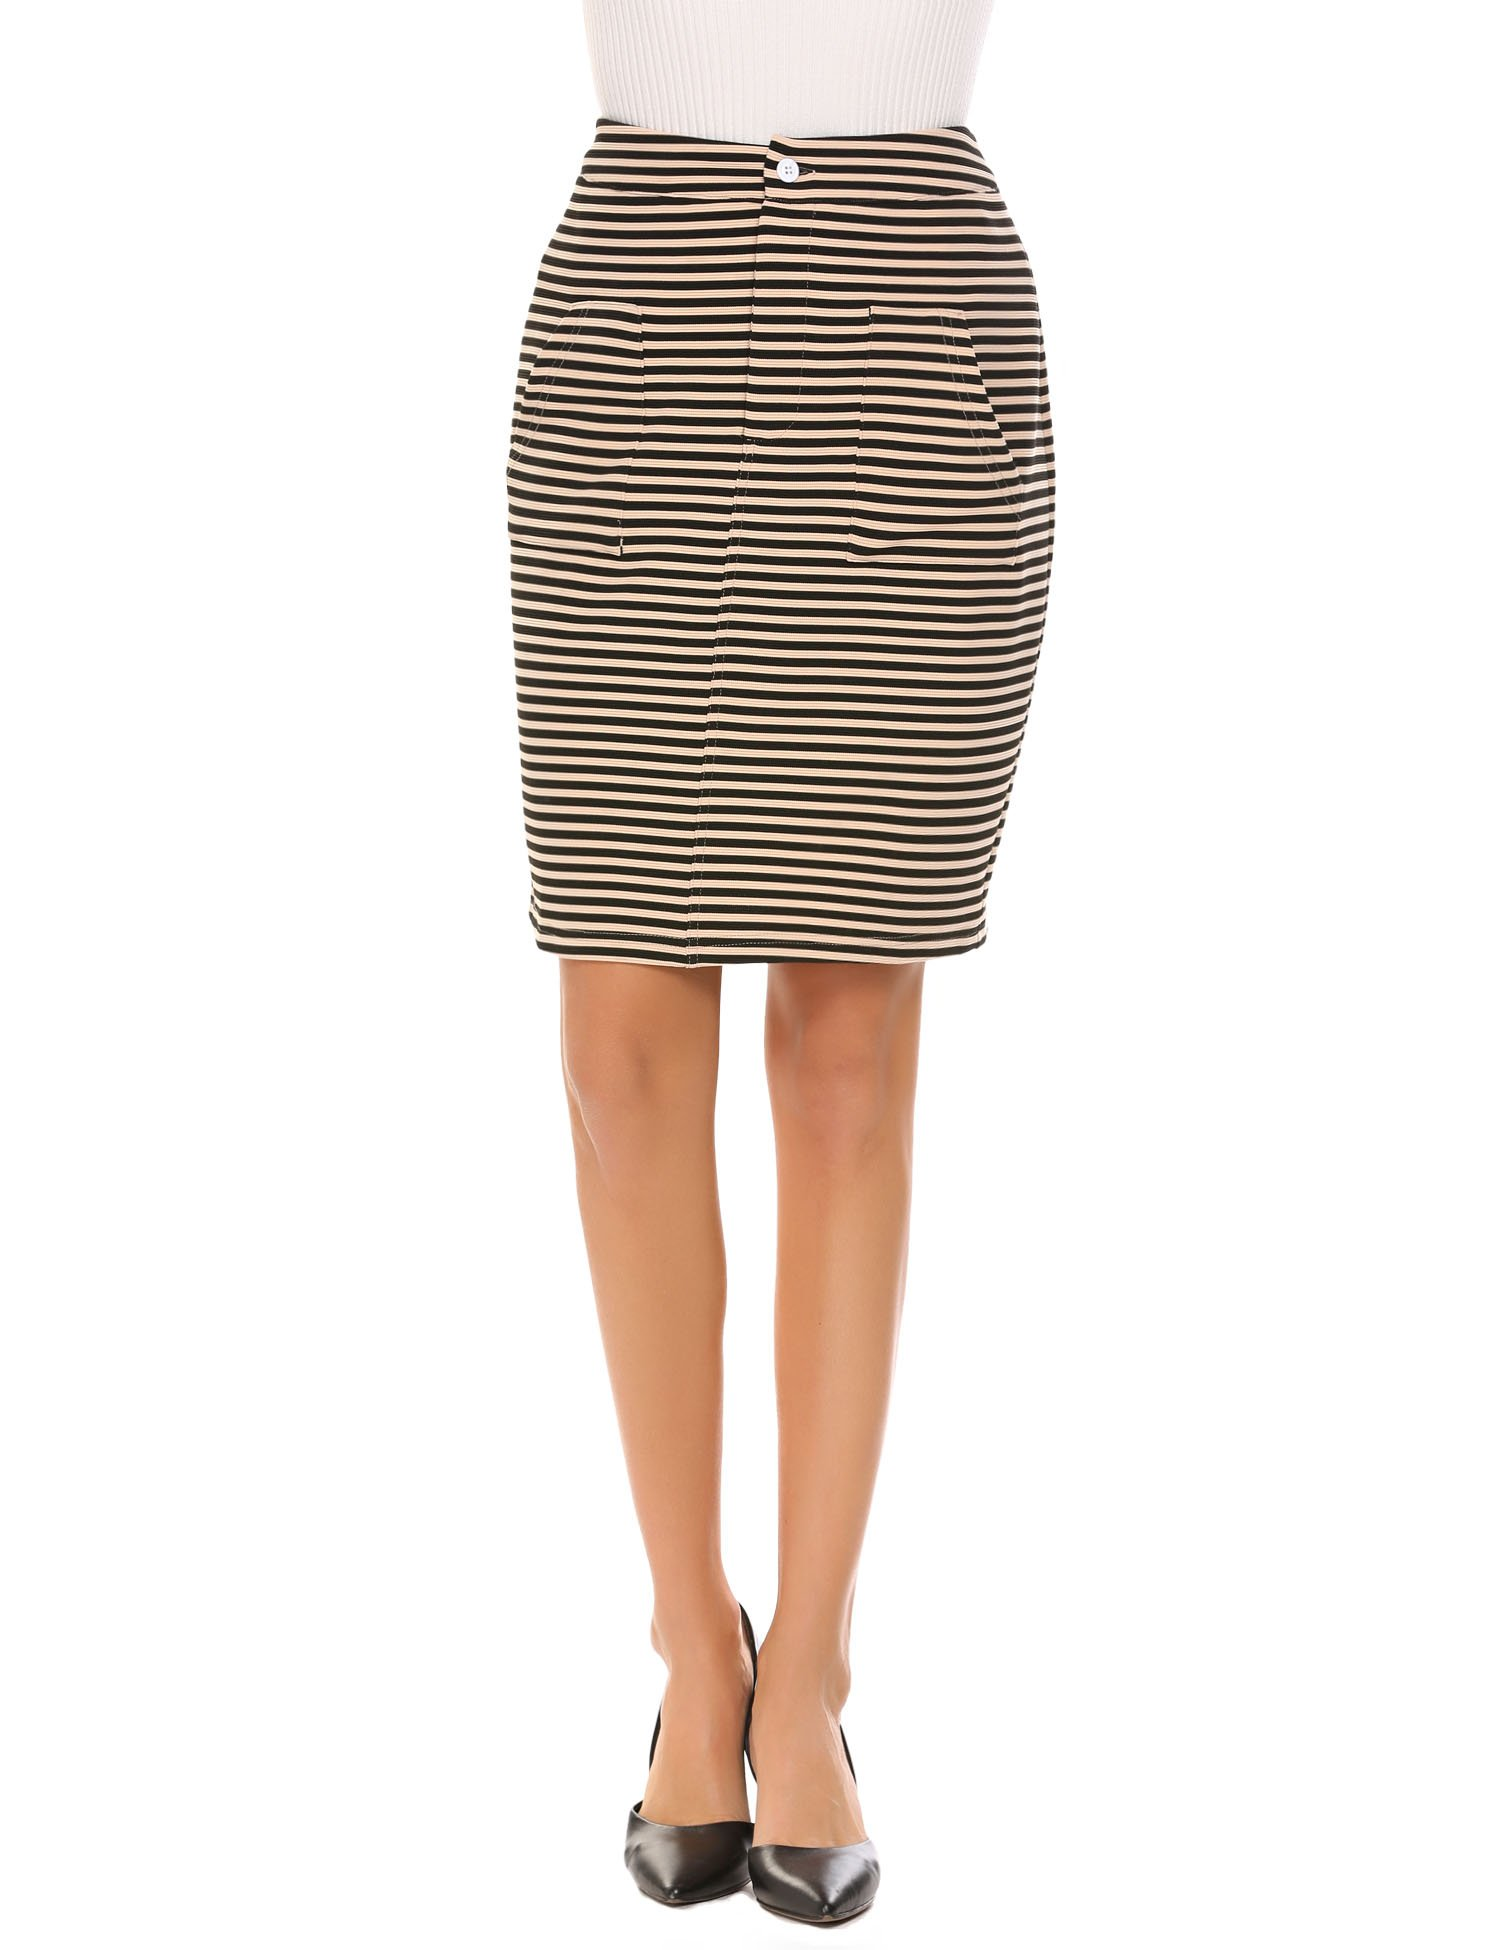 Chigant Women's High Waist Striped Stretchy Pencil Skirt,Beige,Medium